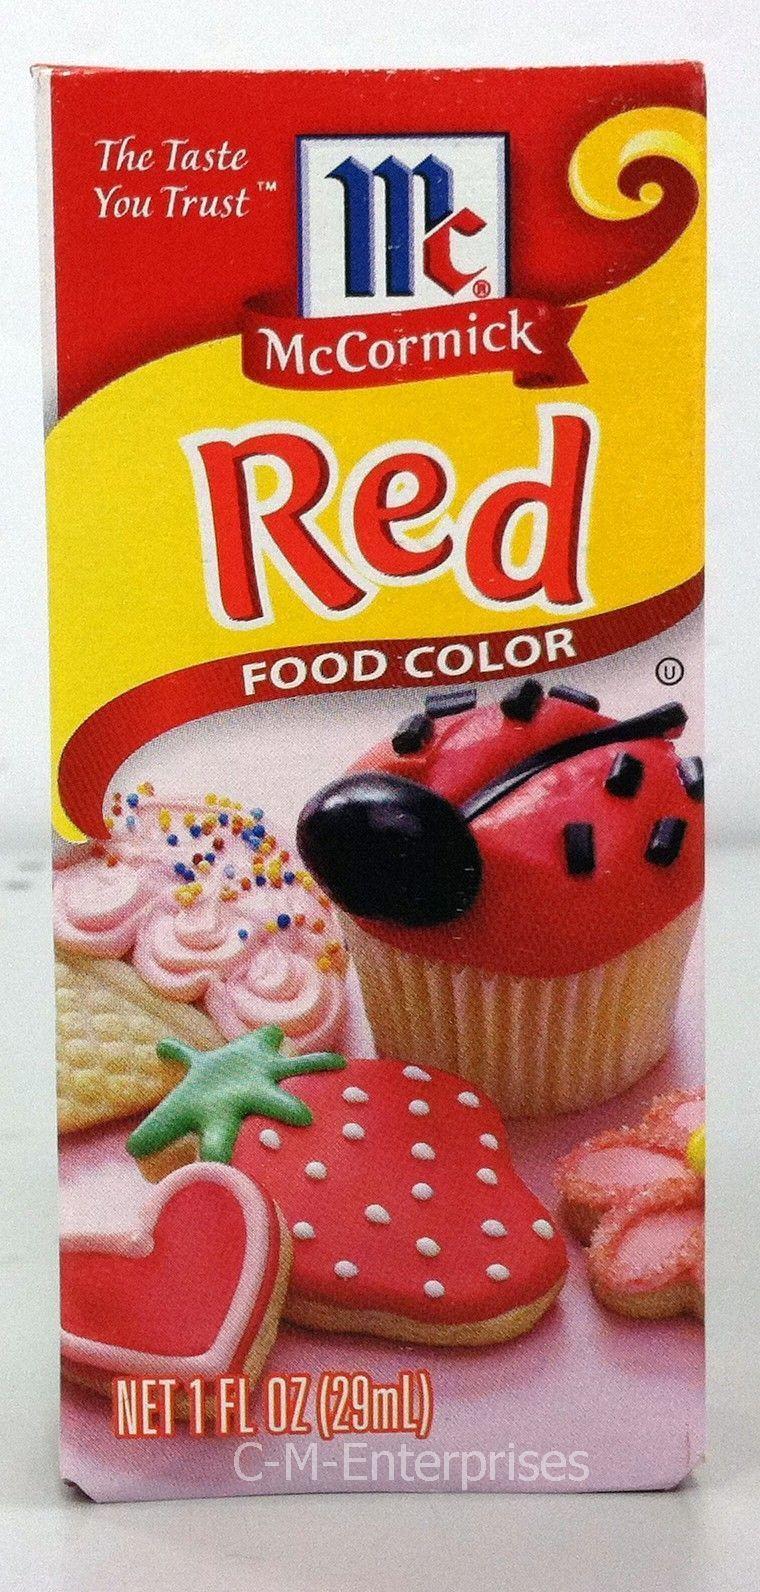 Mccormick Food Coloring: 6 listings